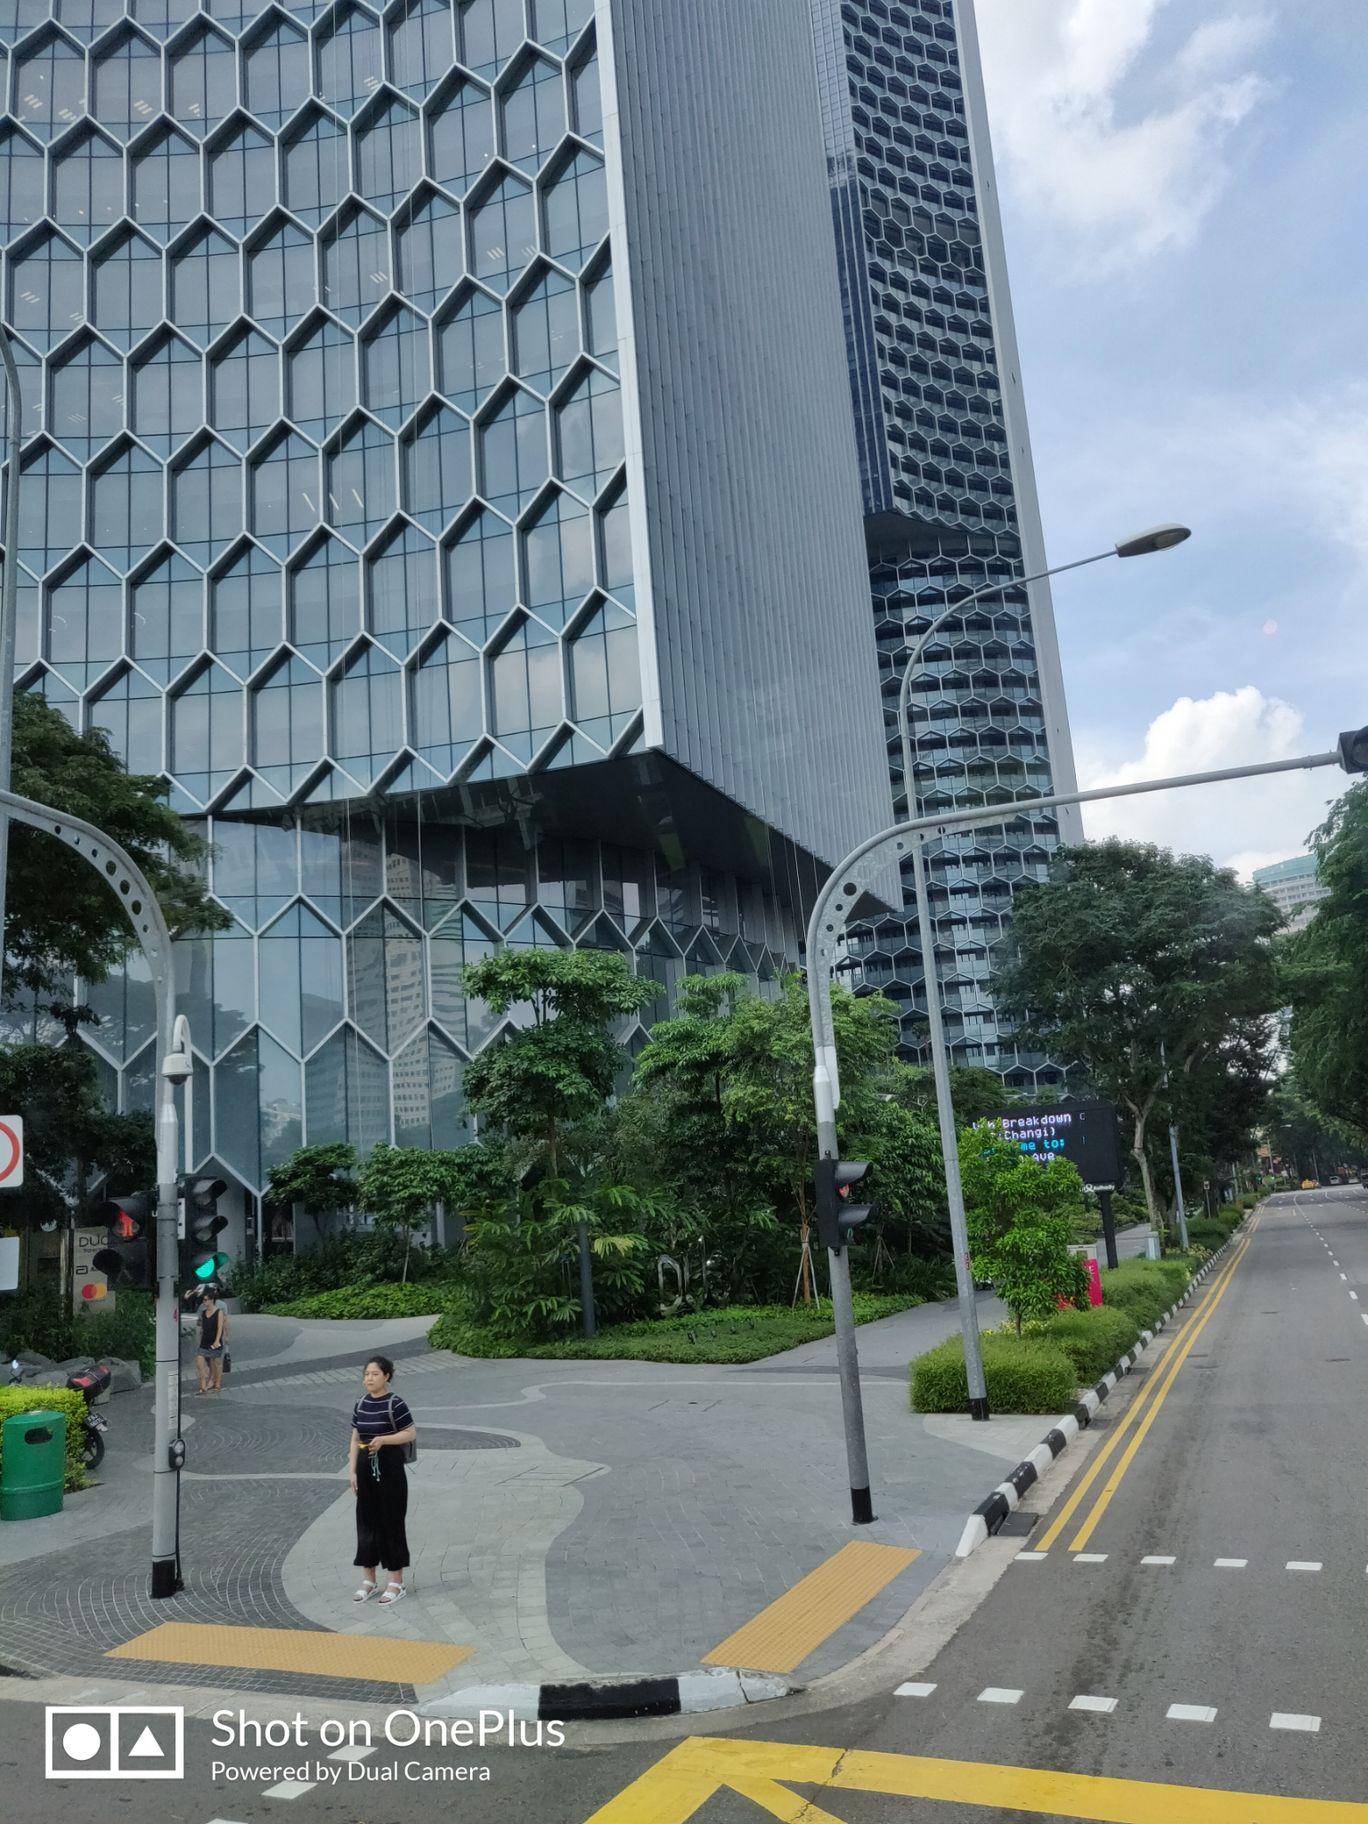 Photo of Singapore By Arihant Jain